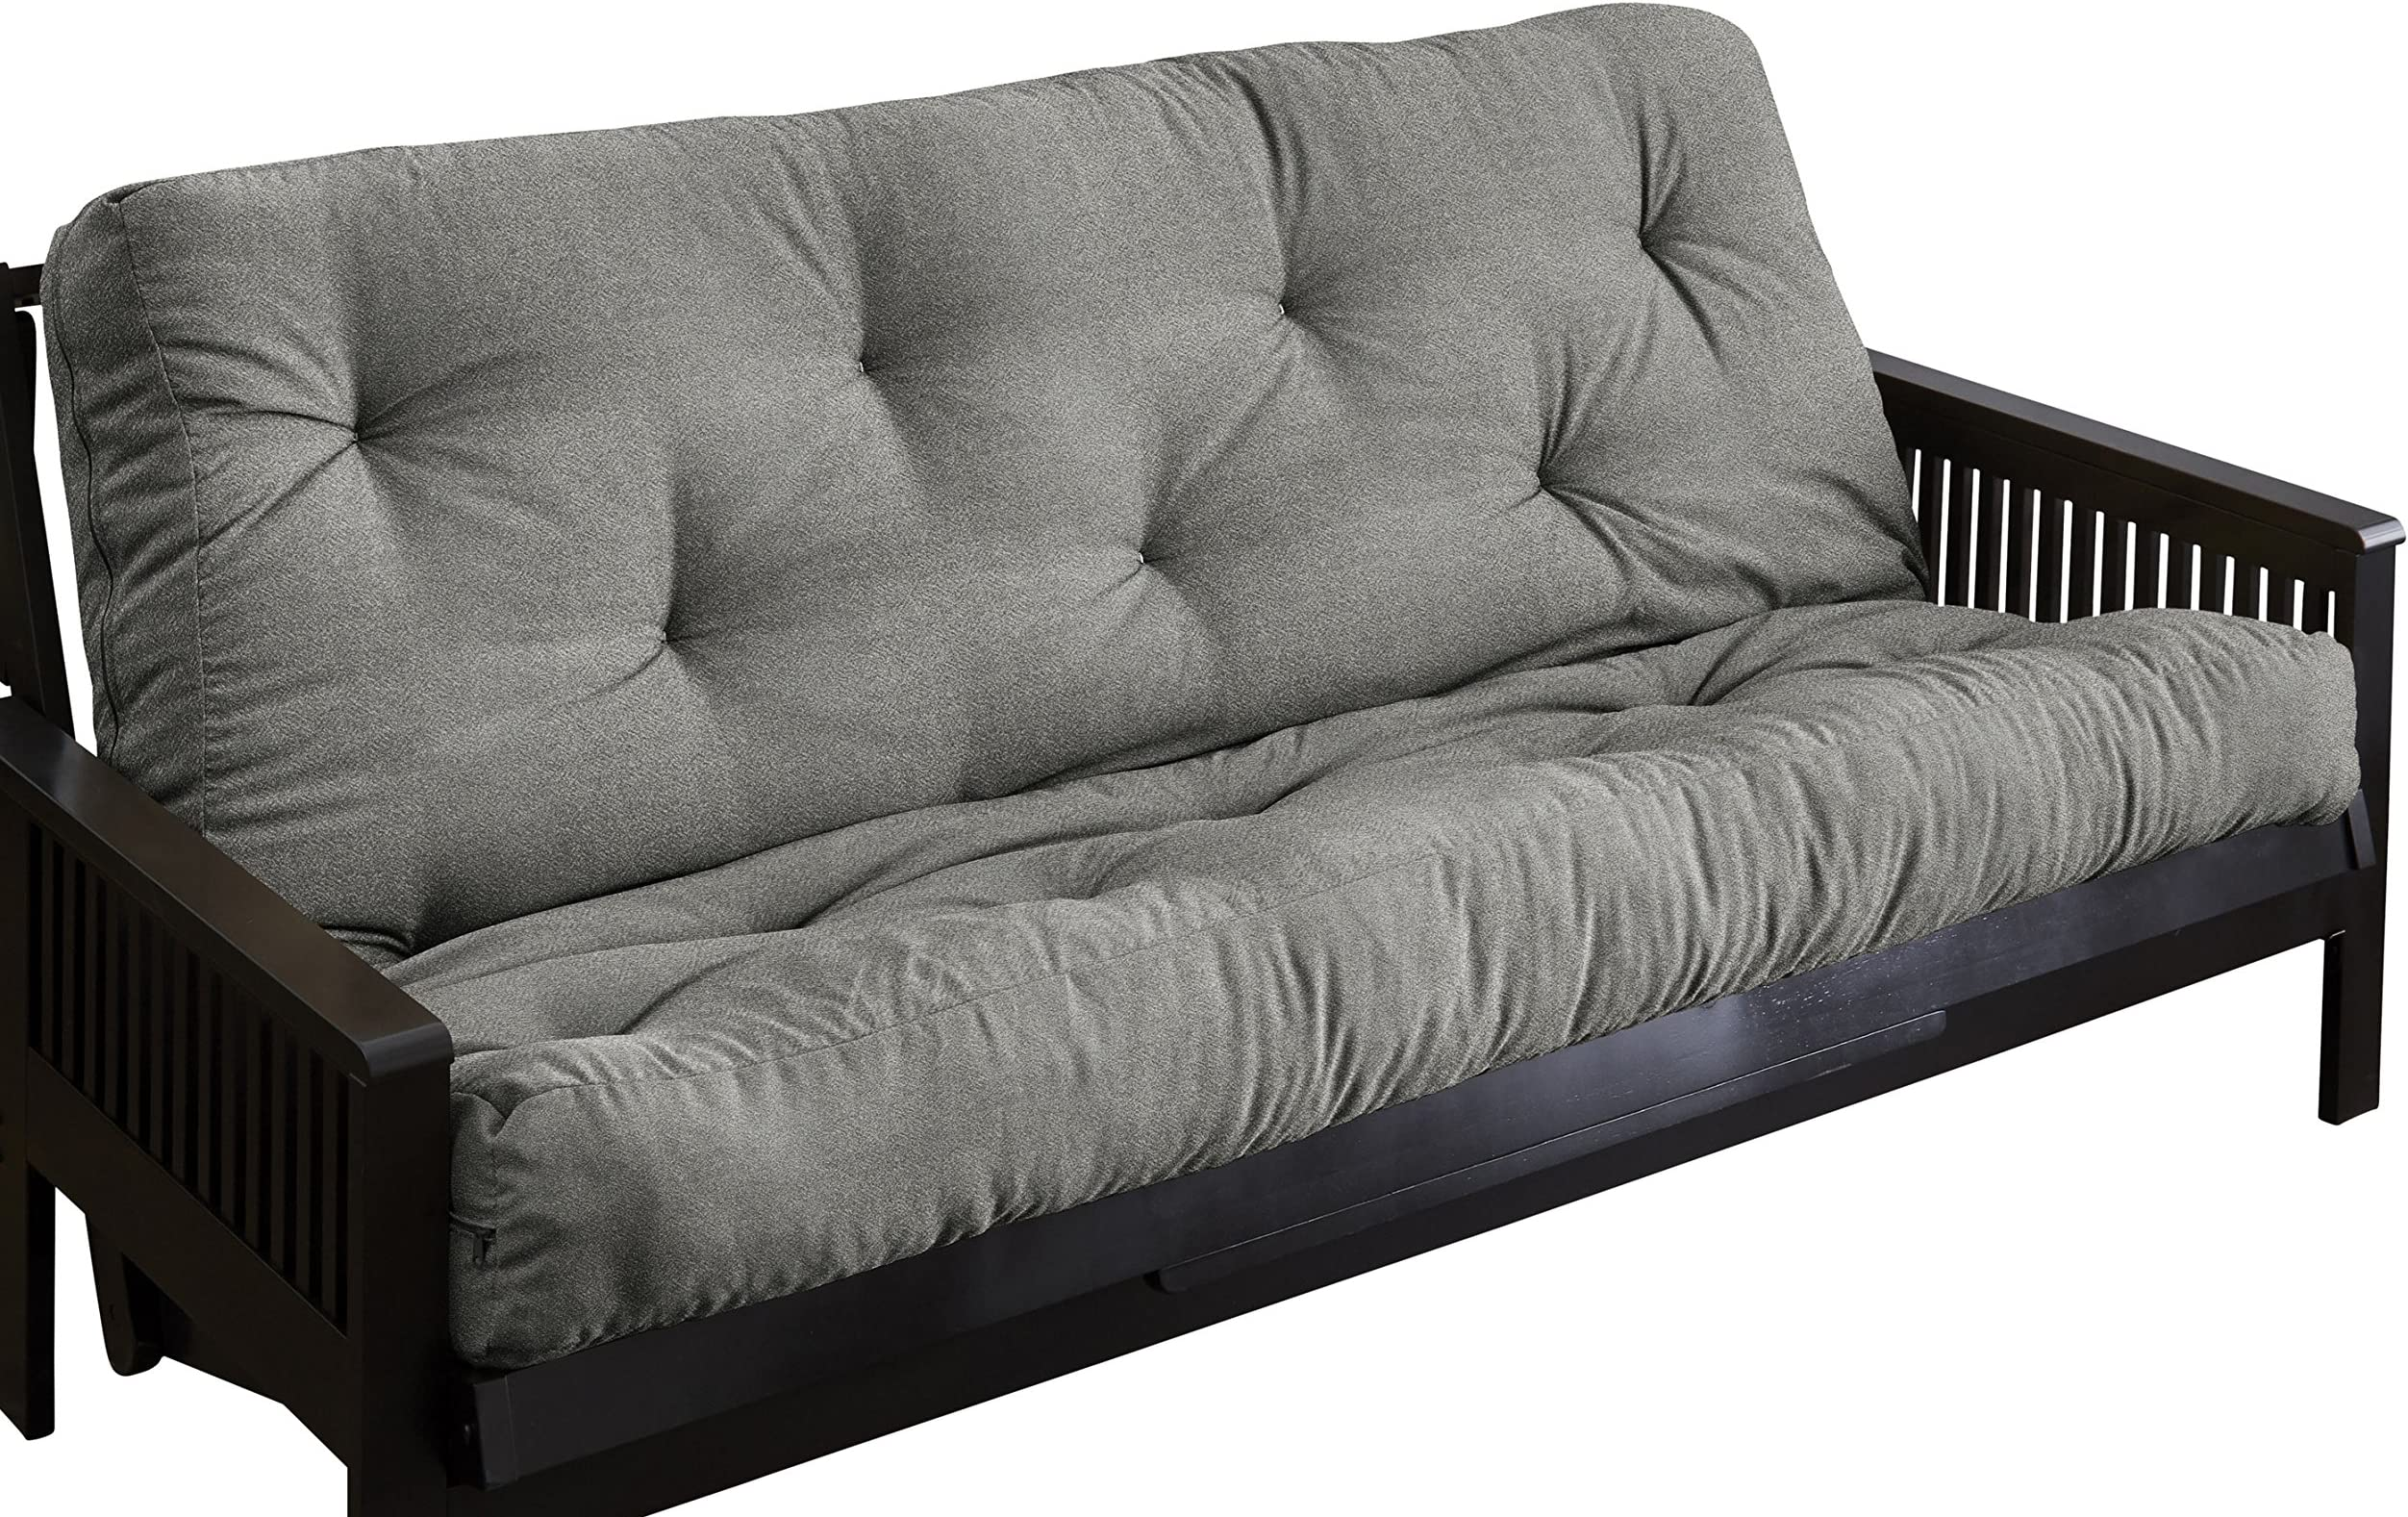 mozaic amft114994 futon     futons   amazon    rh   amazon